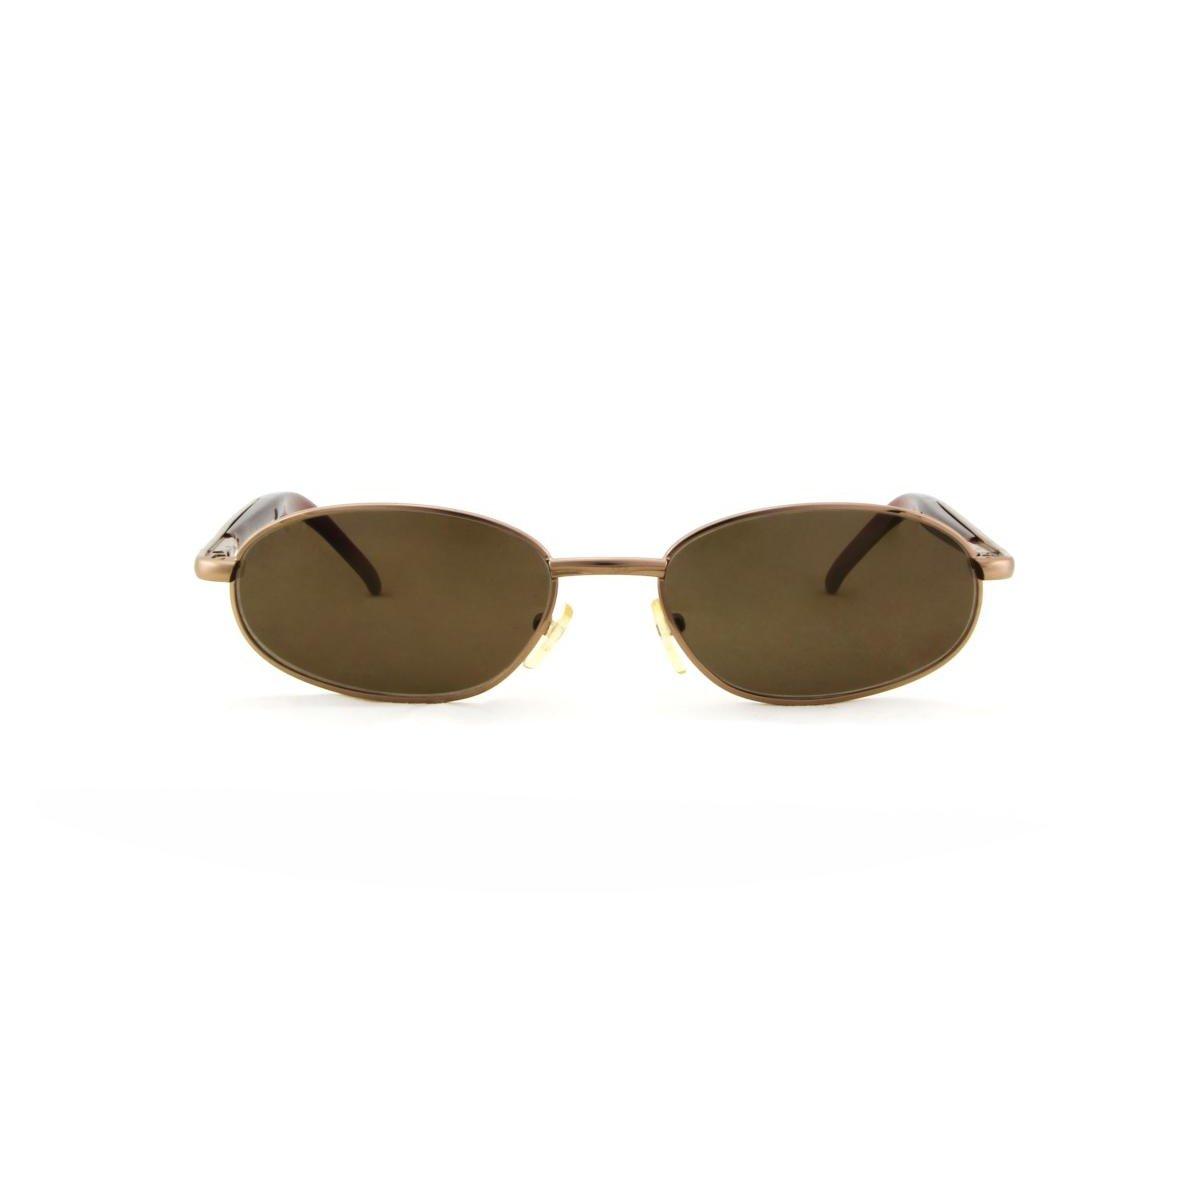 Óculos de Sol Starflex Metal e Acetato e Masculino - Compre Agora ... 39b298f33c